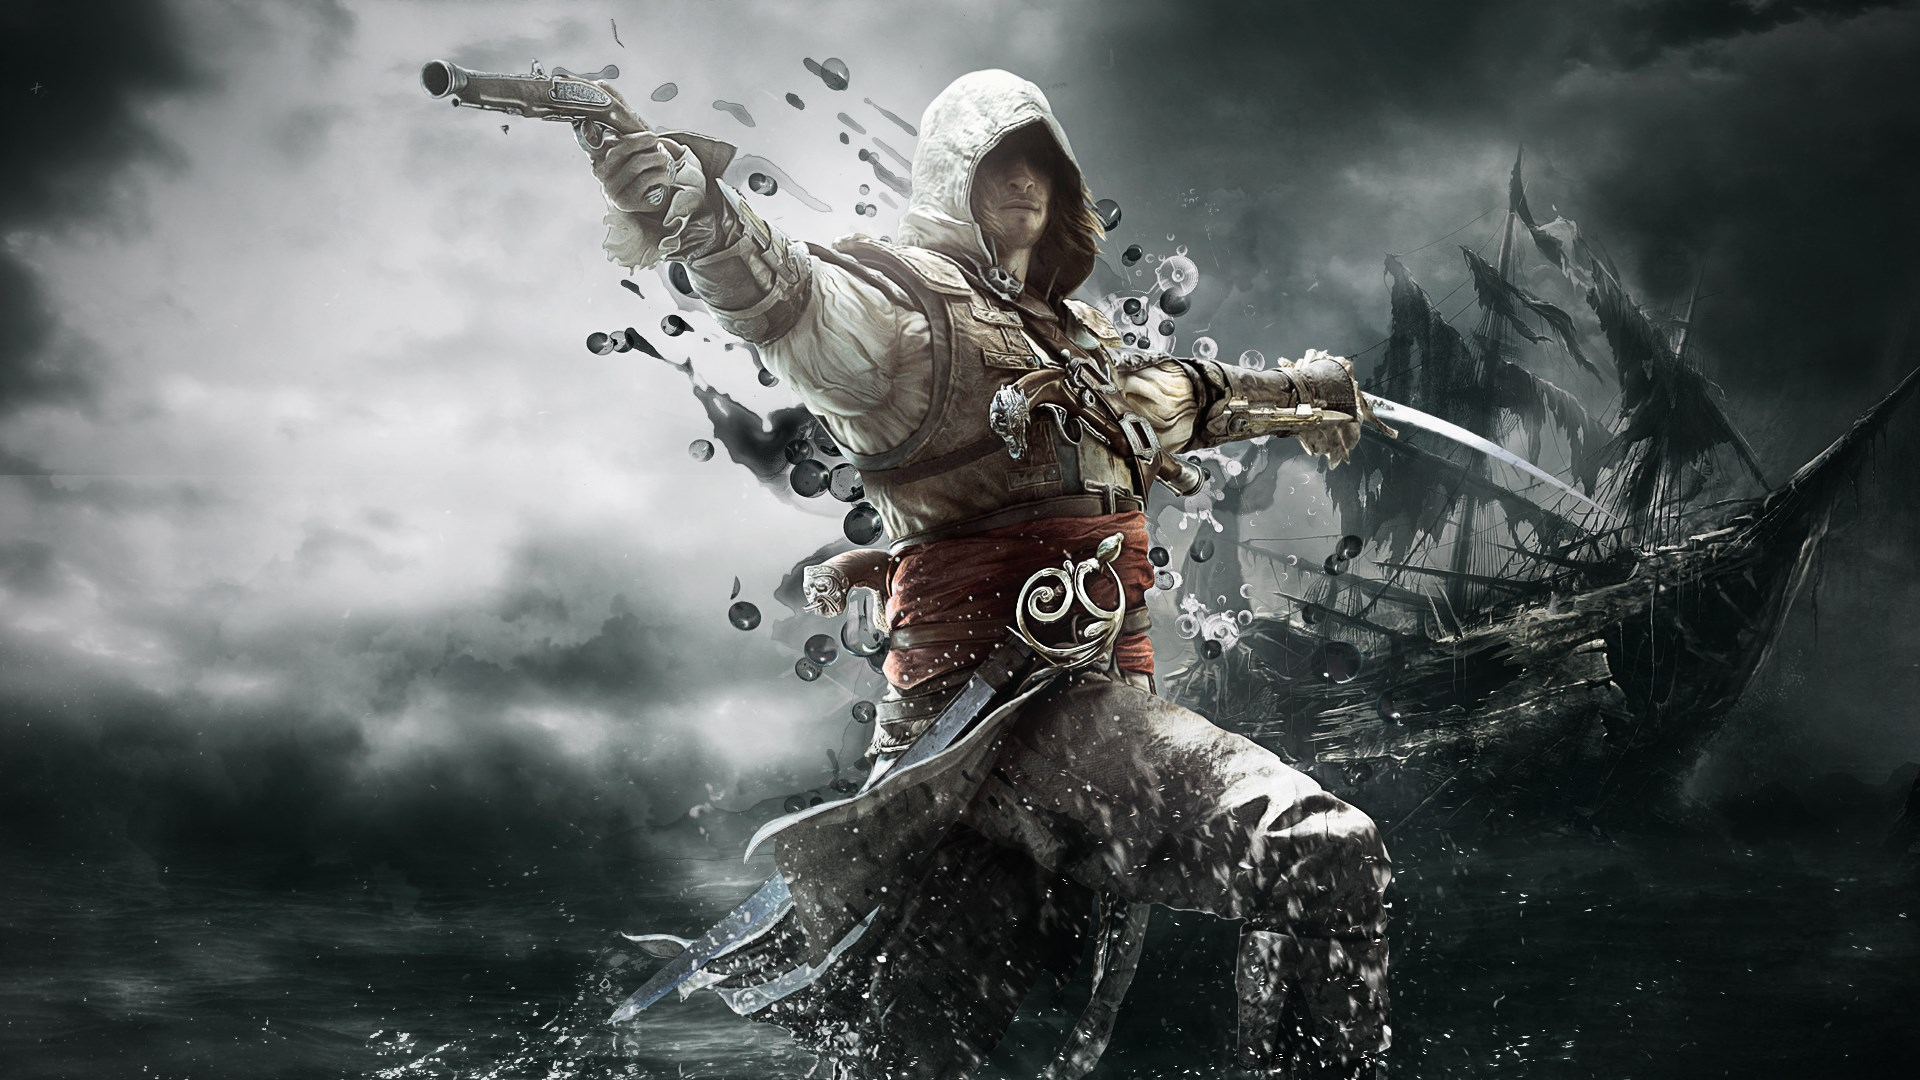 Assassin's Creed Computer Wallpaper